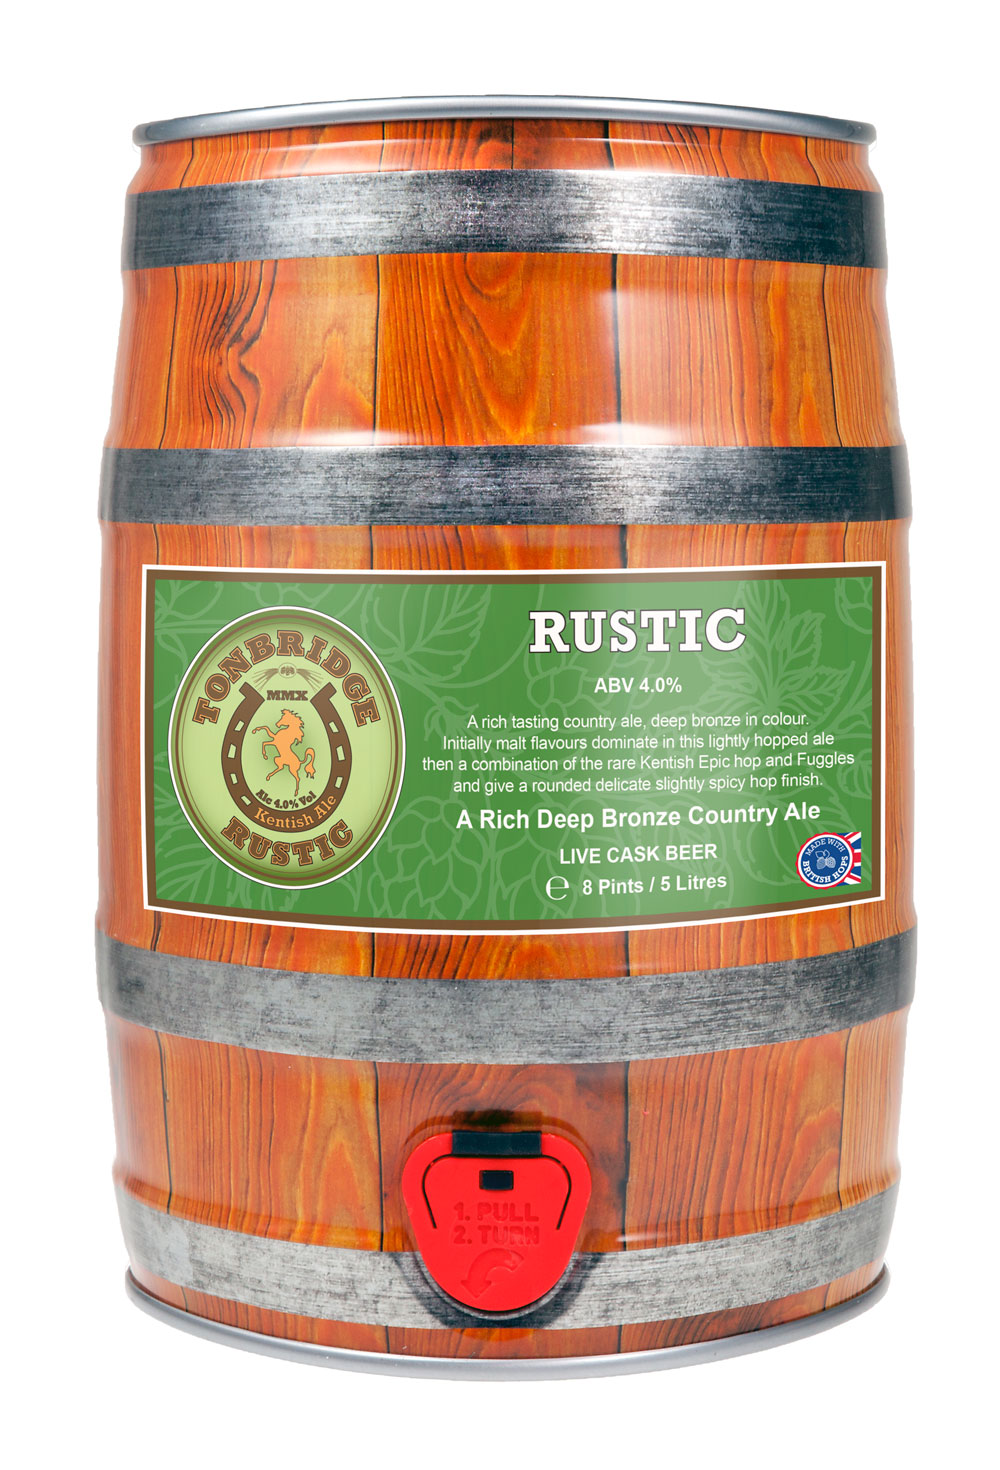 Rustic (Tonbridge Brewery)